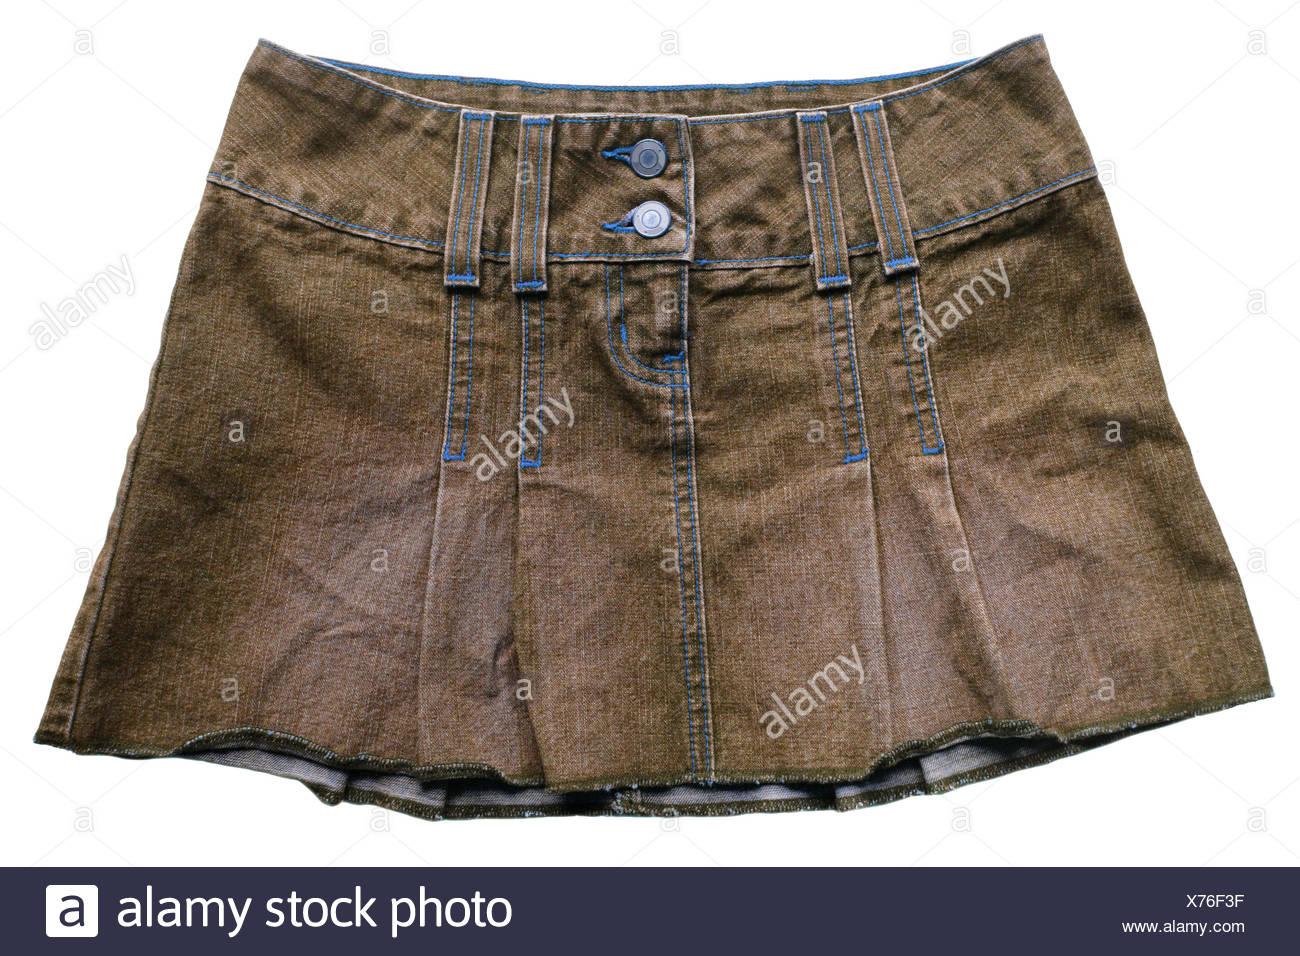 Jeans skirt - Stock Image